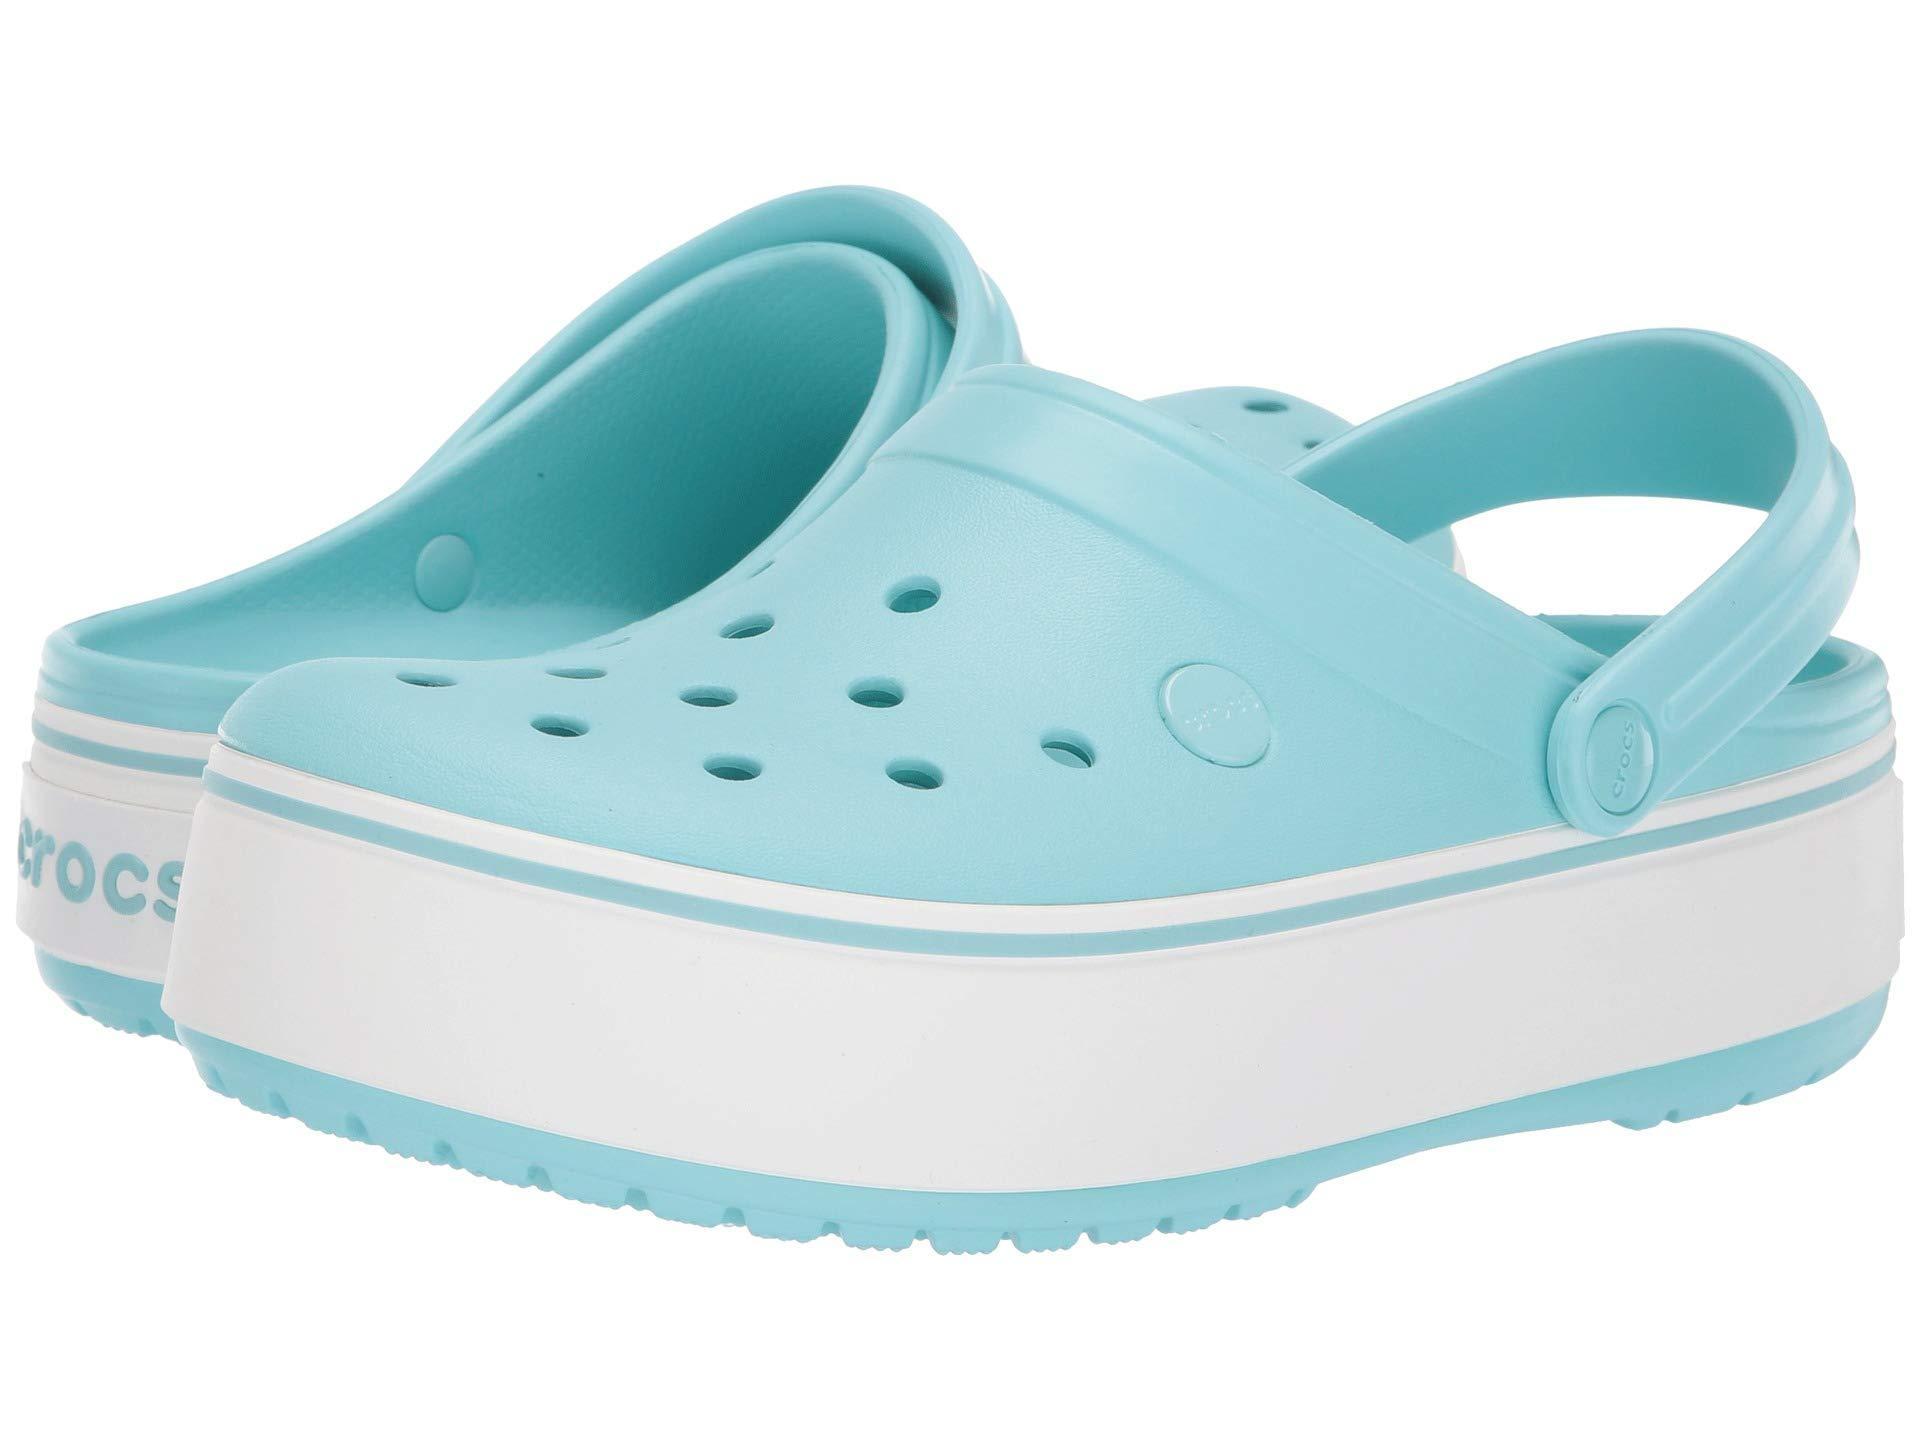 94d01c3daf91 Lyst - Crocs™ Crocband Platform Clog (white white) Women s Clog ...